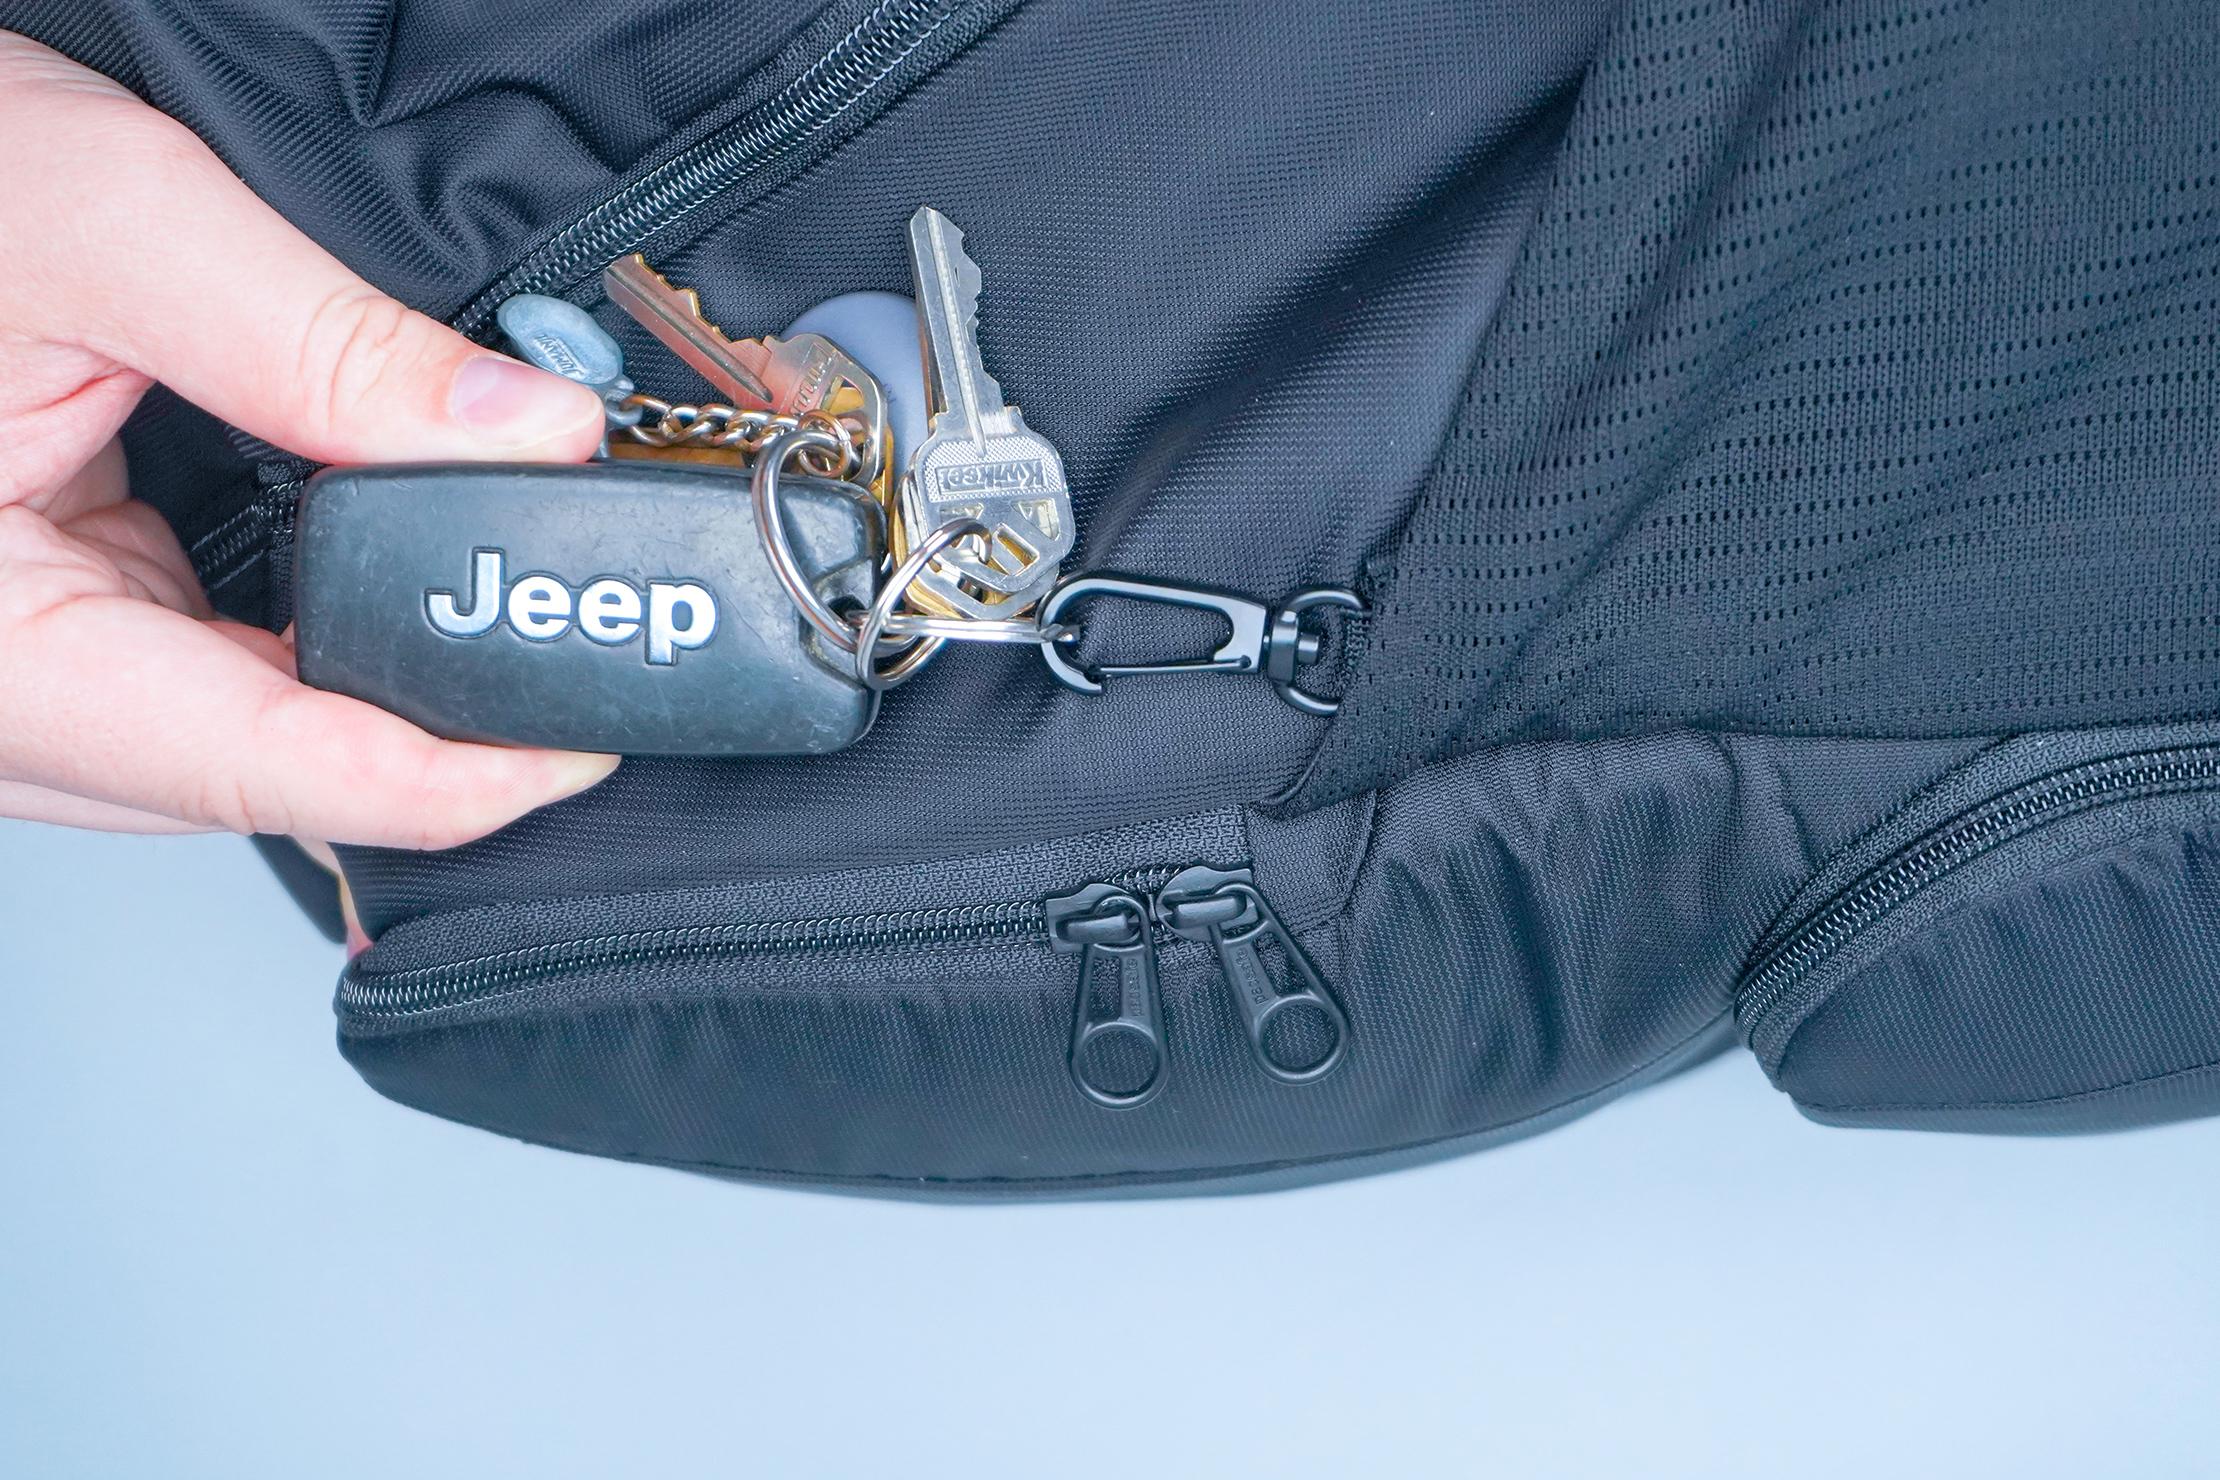 Pacsafe Metrosafe LS450 Anti-Theft Backpack Elastic Key Clip